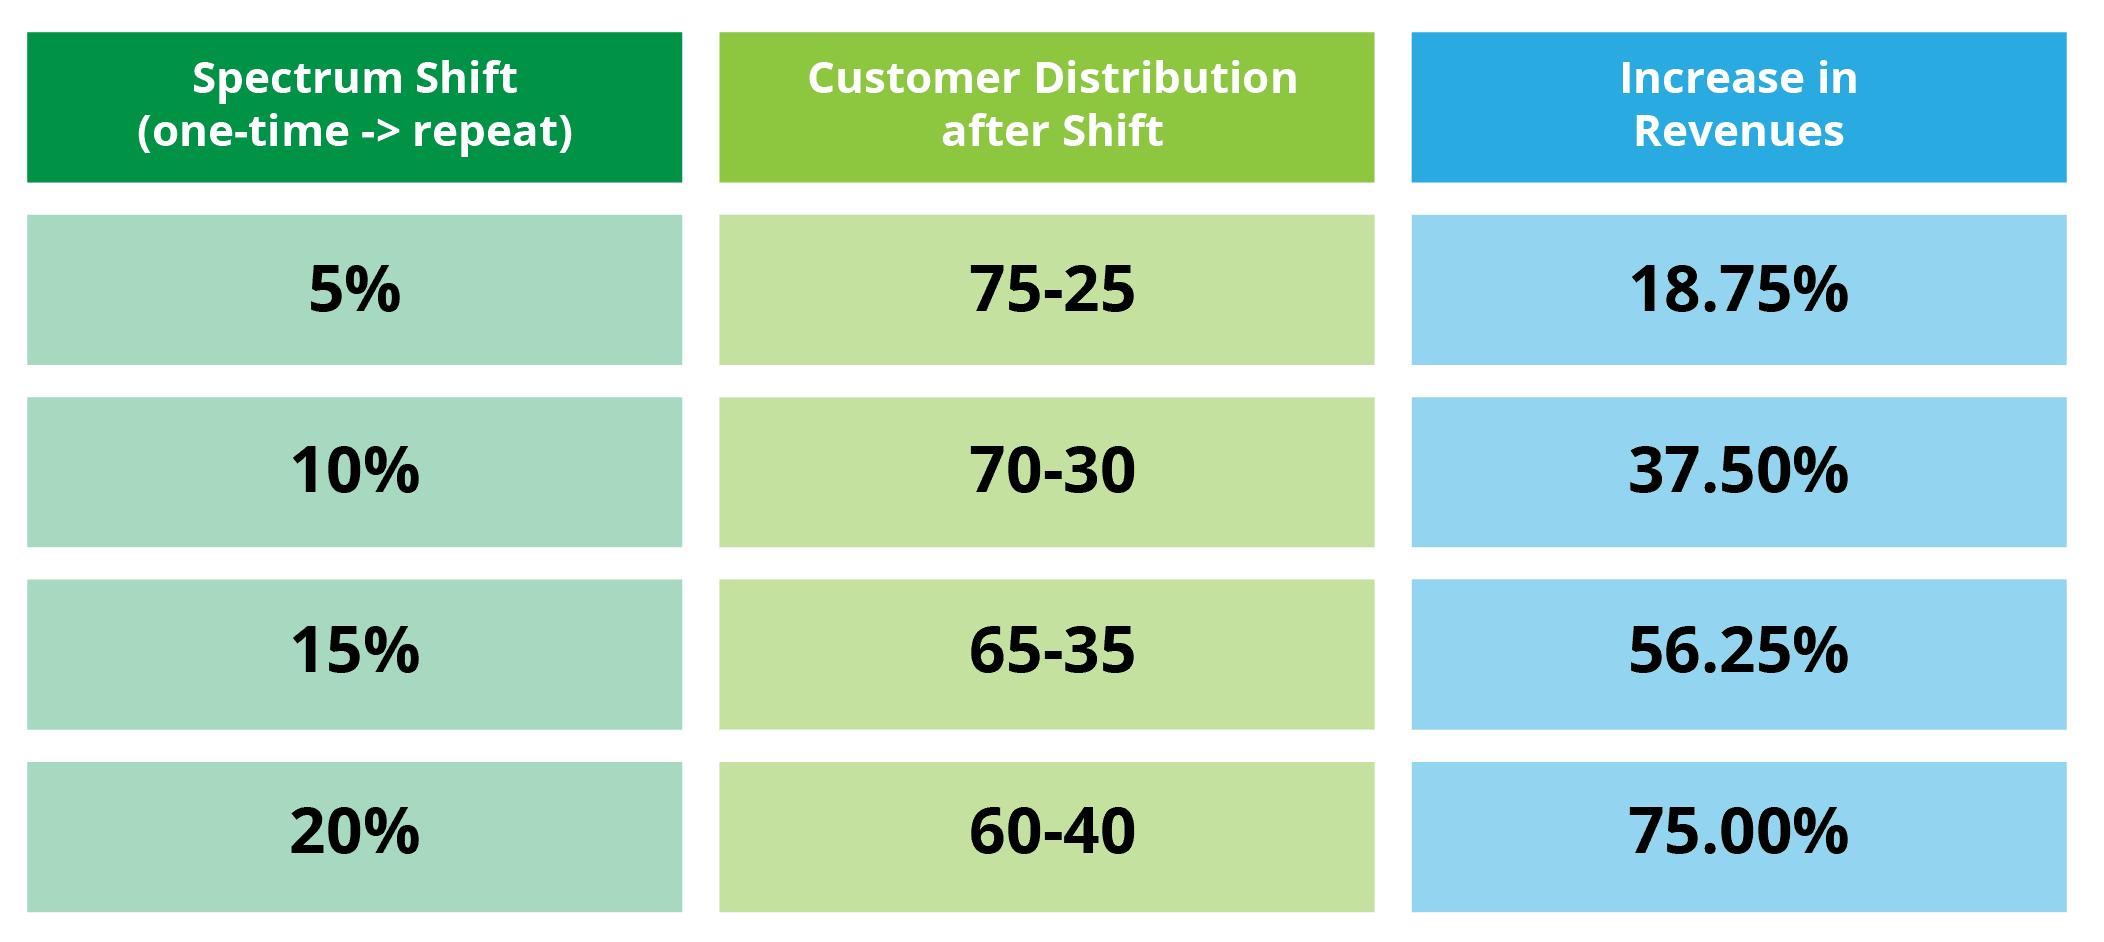 Spectrum shift and increase in revenue